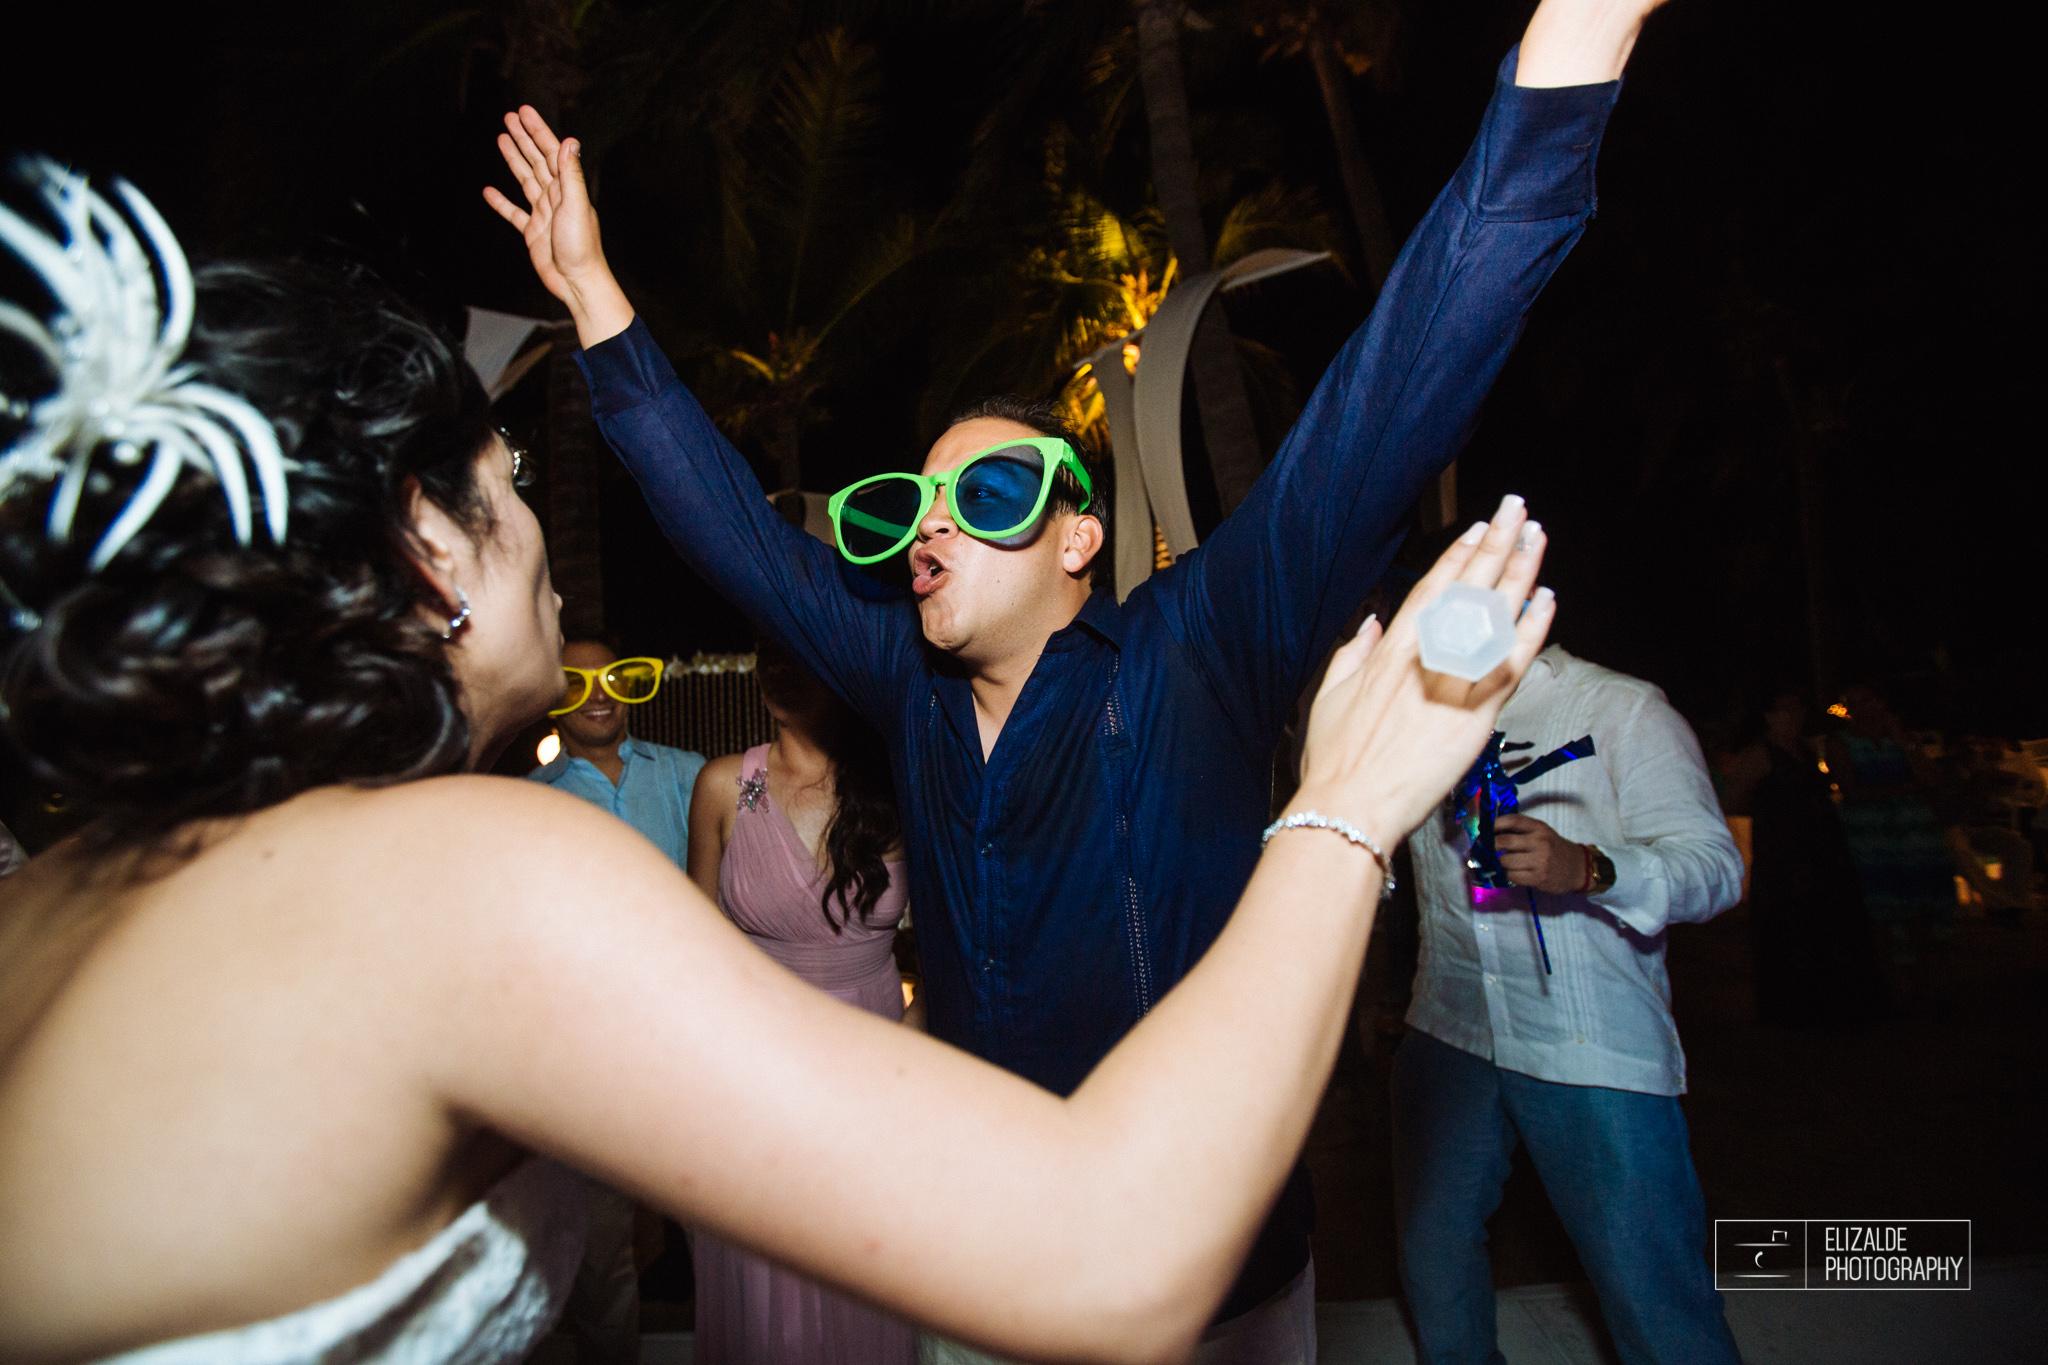 Pay and Ferran_Acapulco_Destination Wedding_Elizalde Photography-136.jpg